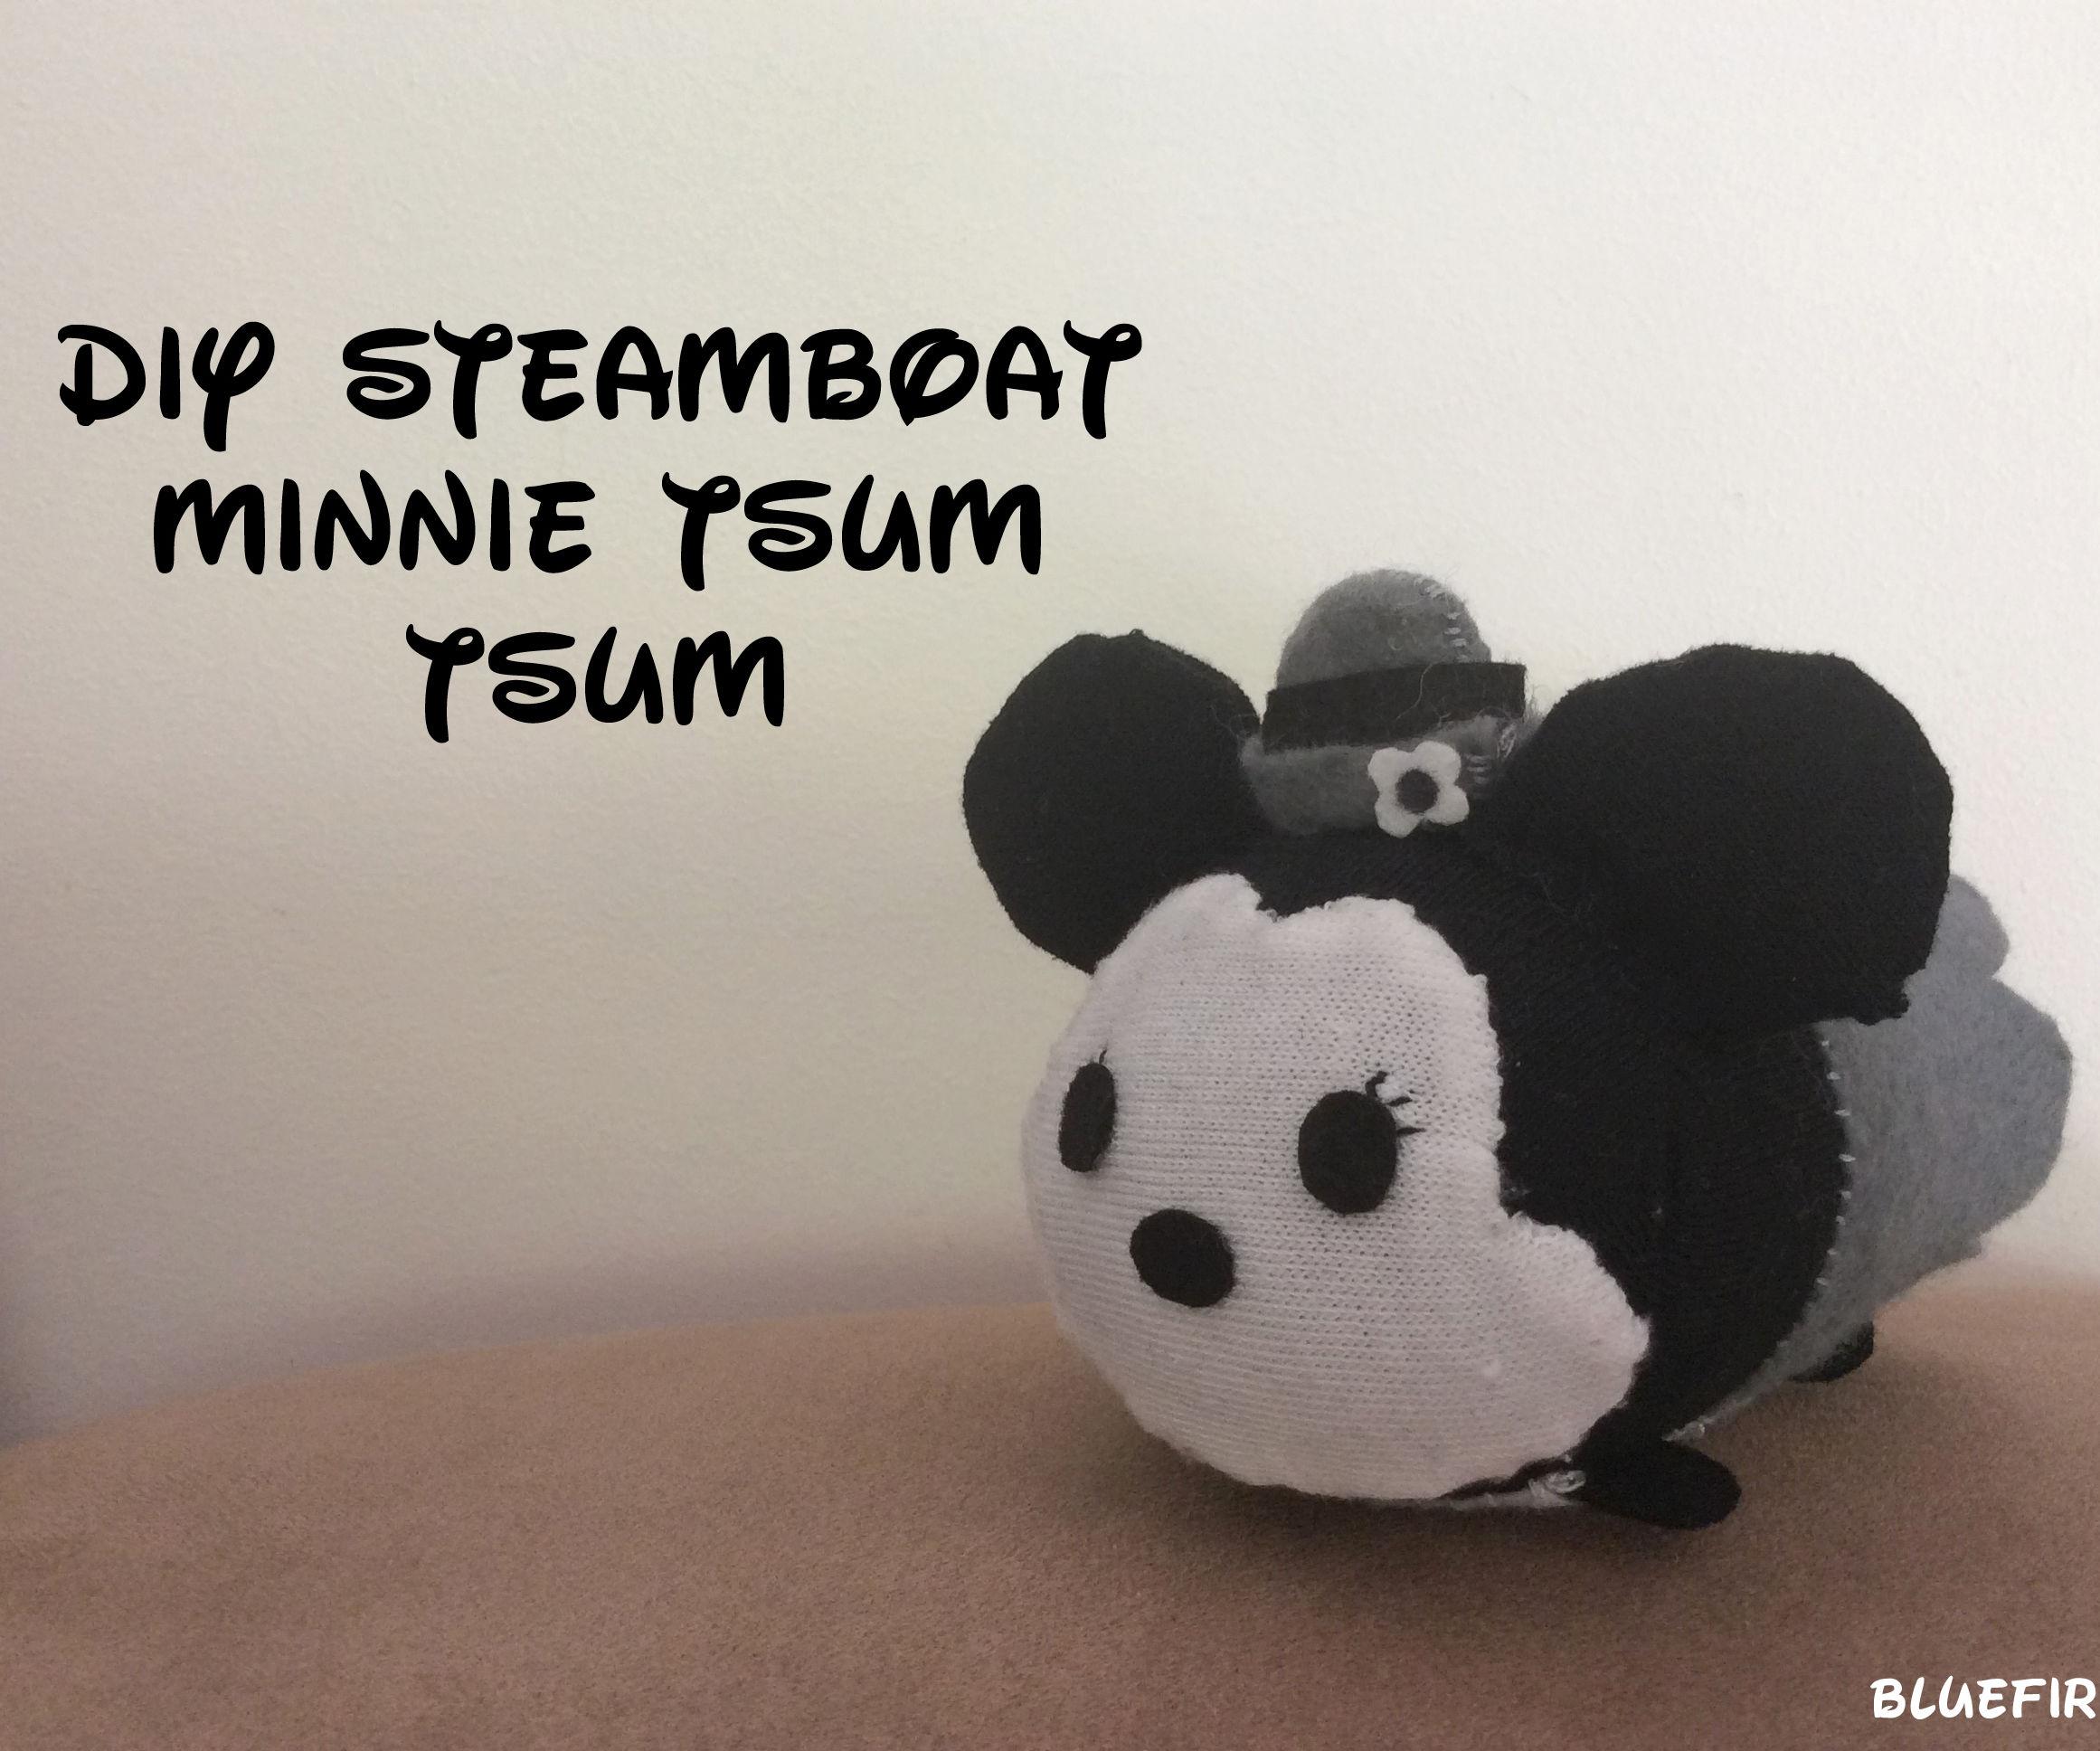 DIY Steamboat Minnie Tsum Tsum